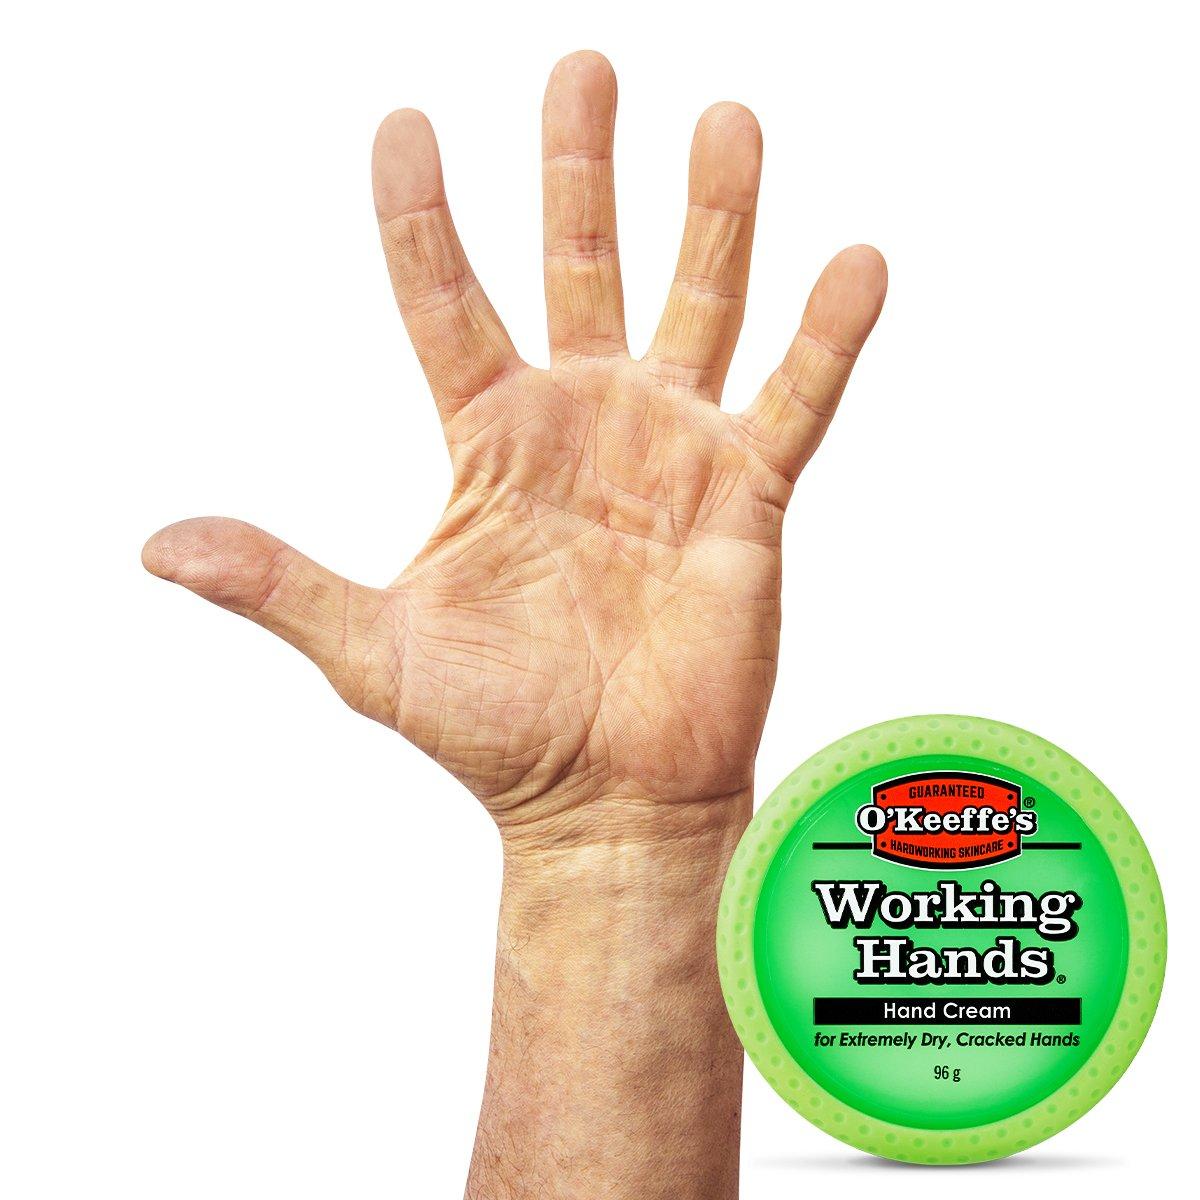 Builders Hand Cream | Hand Cream For Dry Skin | O'Keeffe's | O